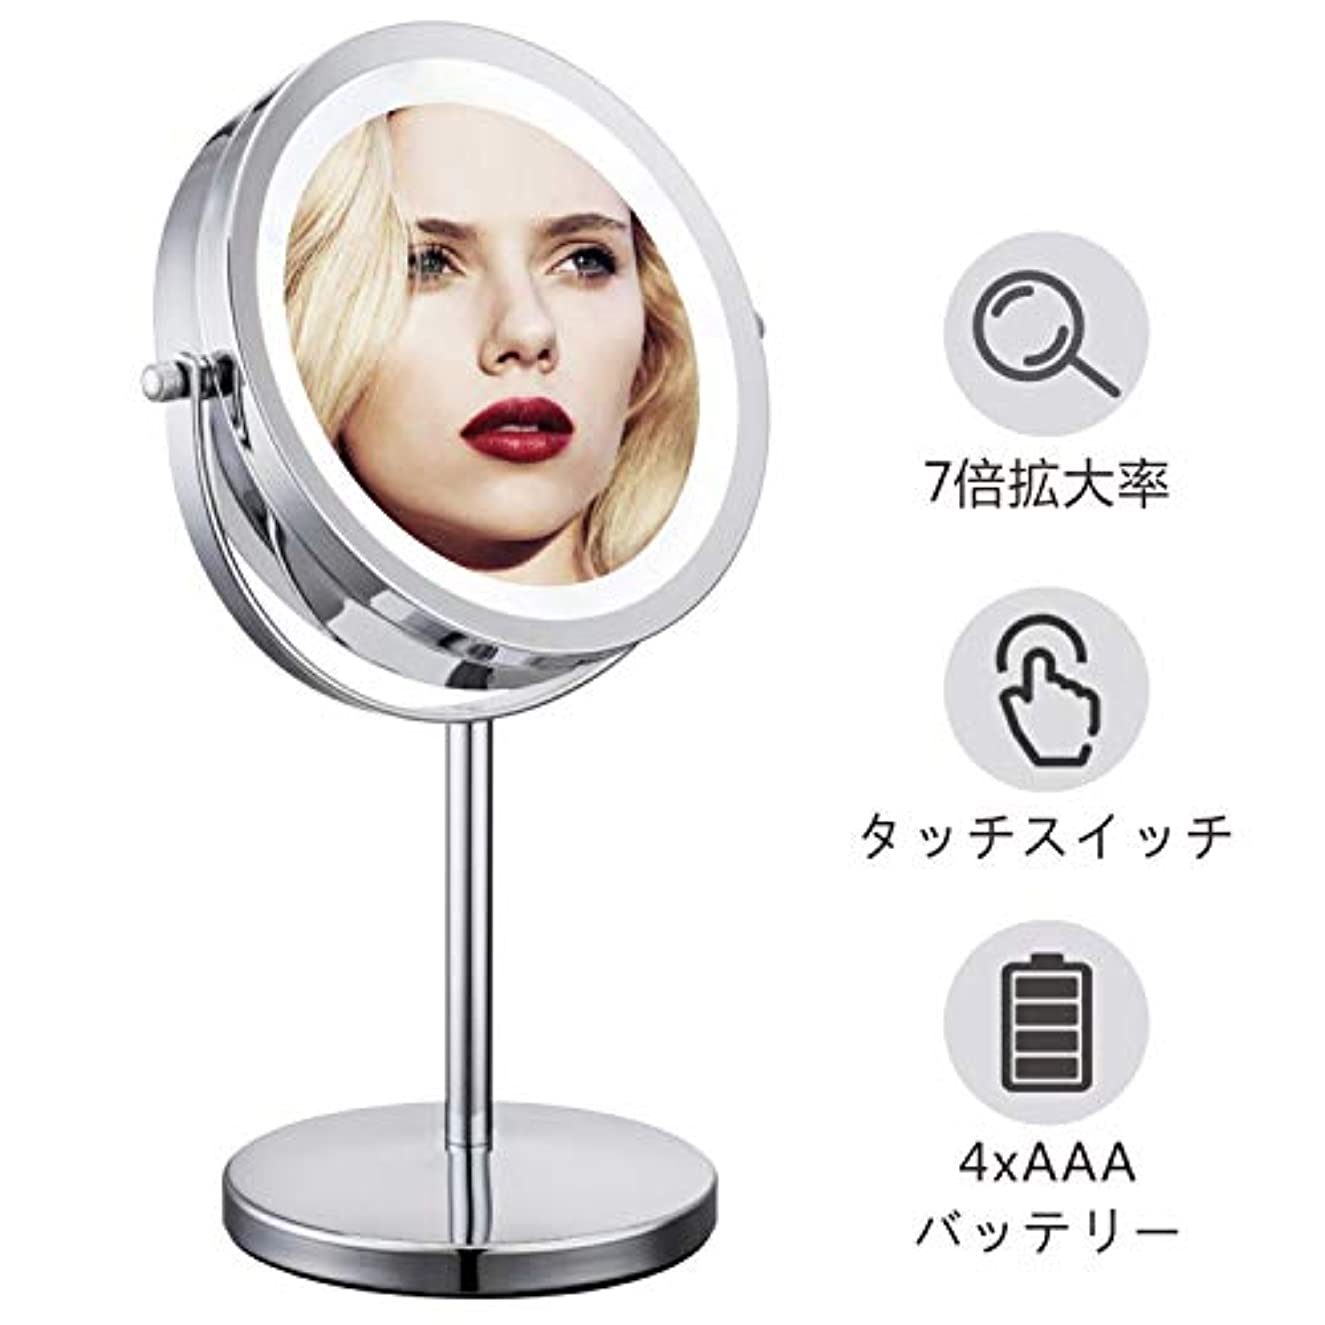 清める賞自治的Minracler 化粧鏡 7倍拡大 卓上 化粧ミラー led両面鏡 明るさ調節可能 360度回転 (鏡面155mmΦ) 電池給電